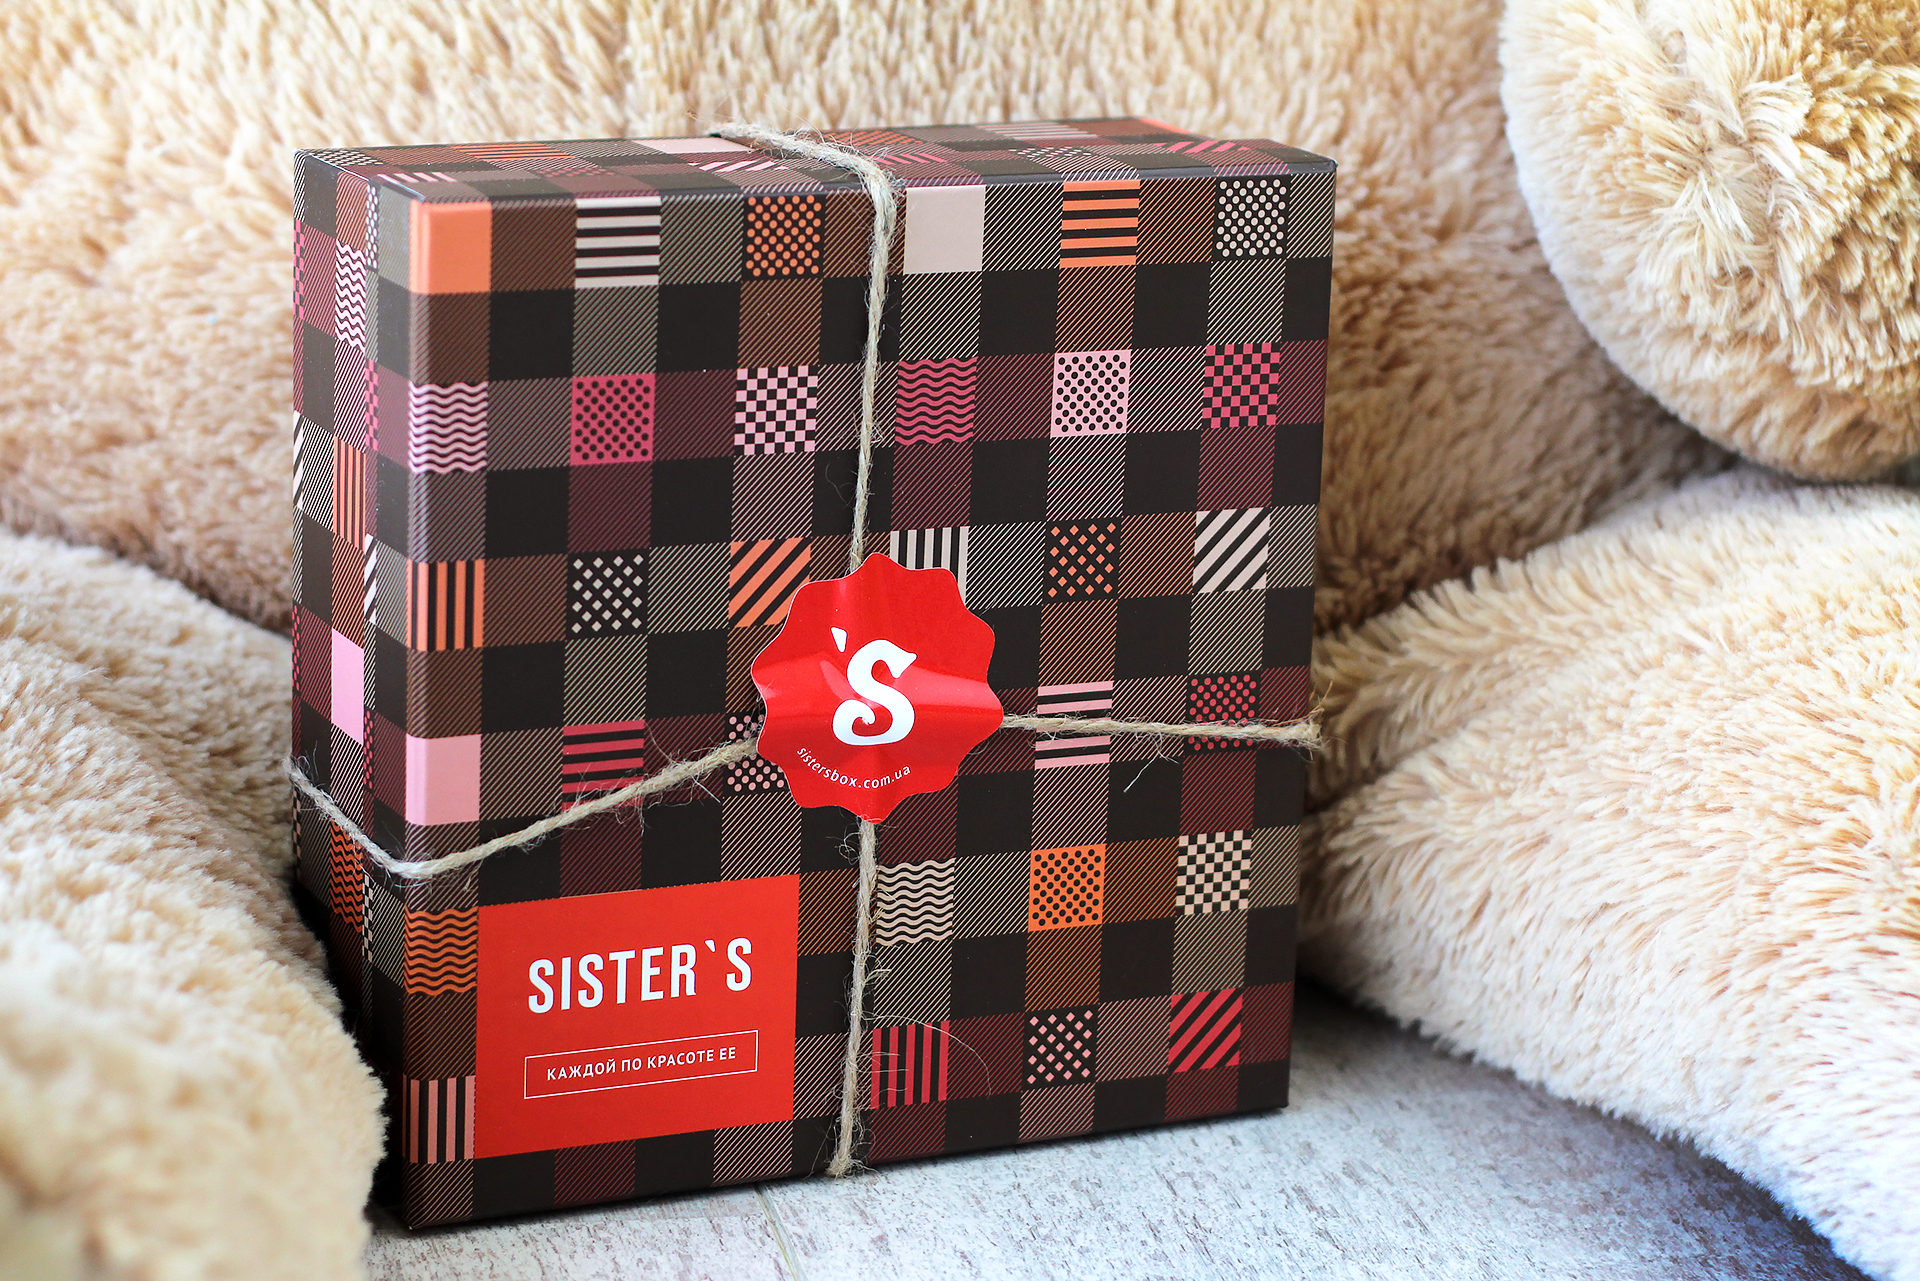 Новая персонализированная коробочка красоты от Sister's Box (август 2016)